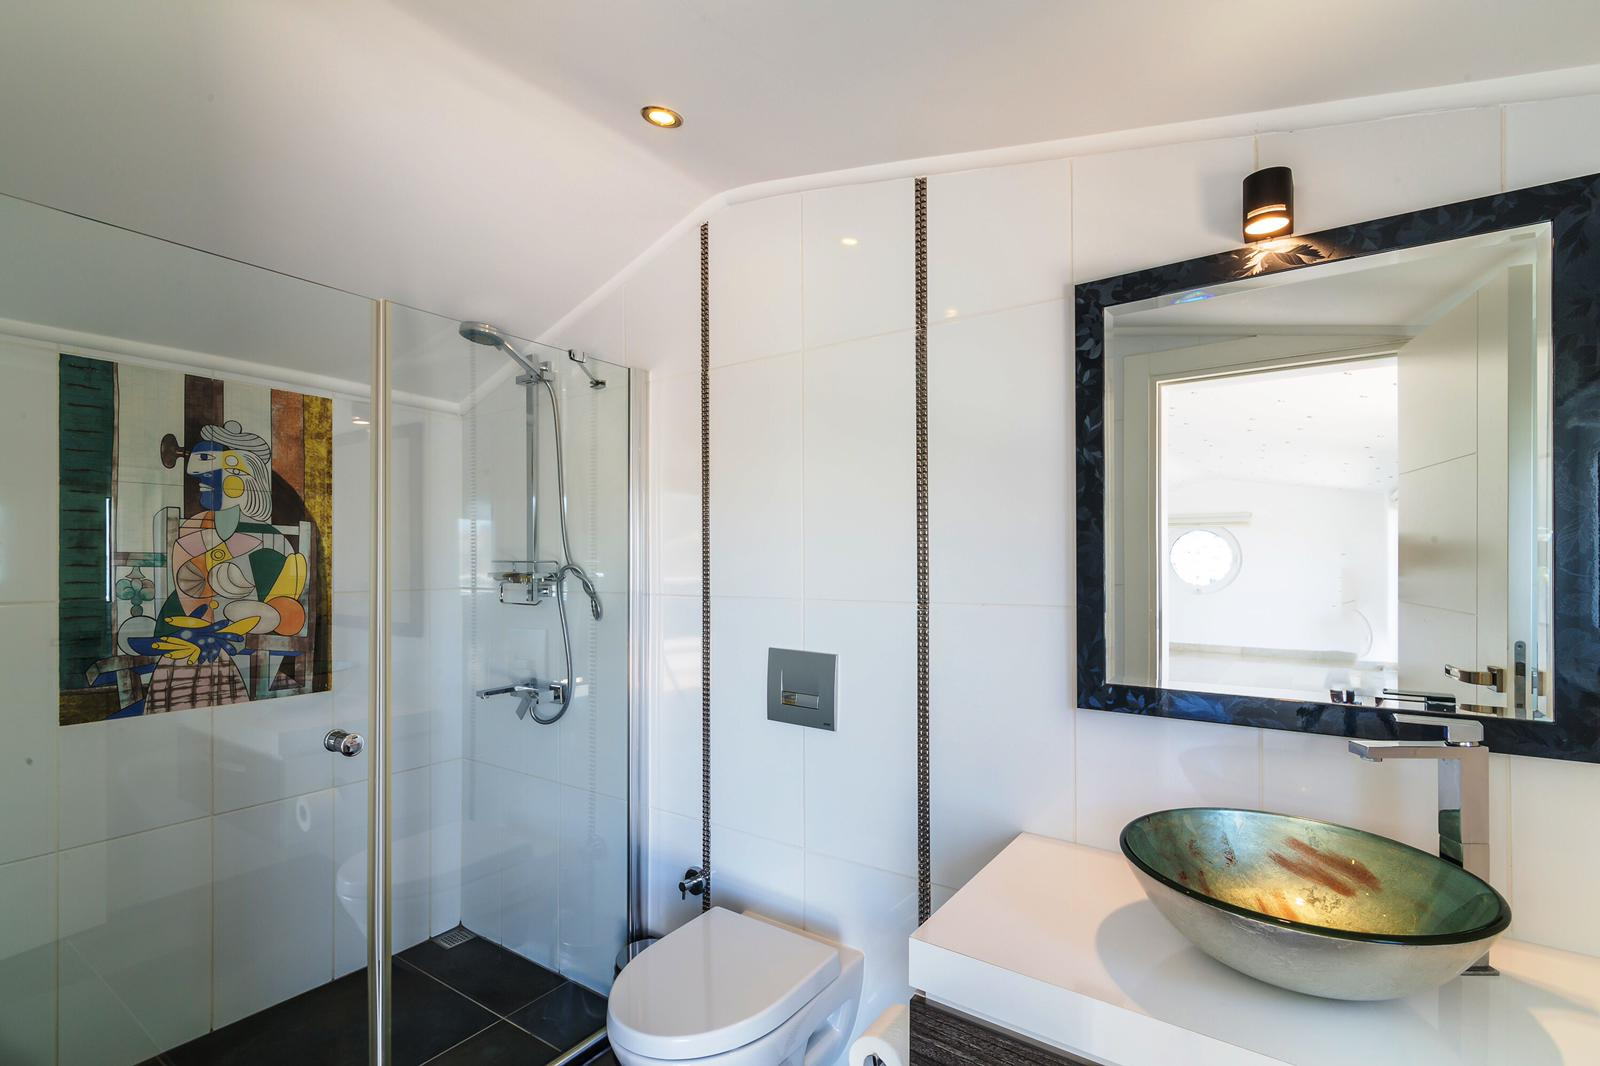 everest picasso bathroom